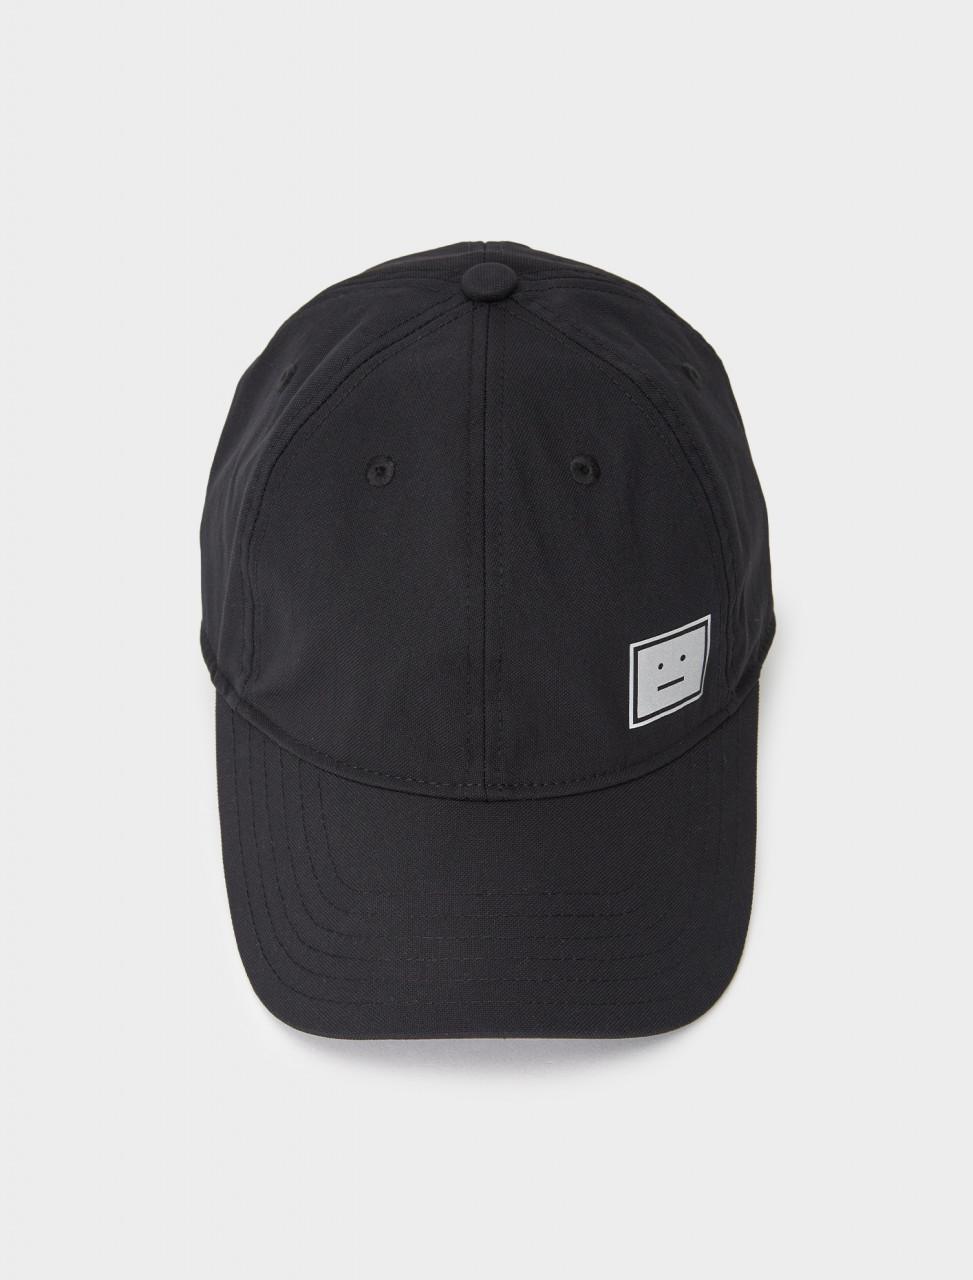 C40139-900 ACNE STUDIOS TWILL BASEBALL CAP BLACK